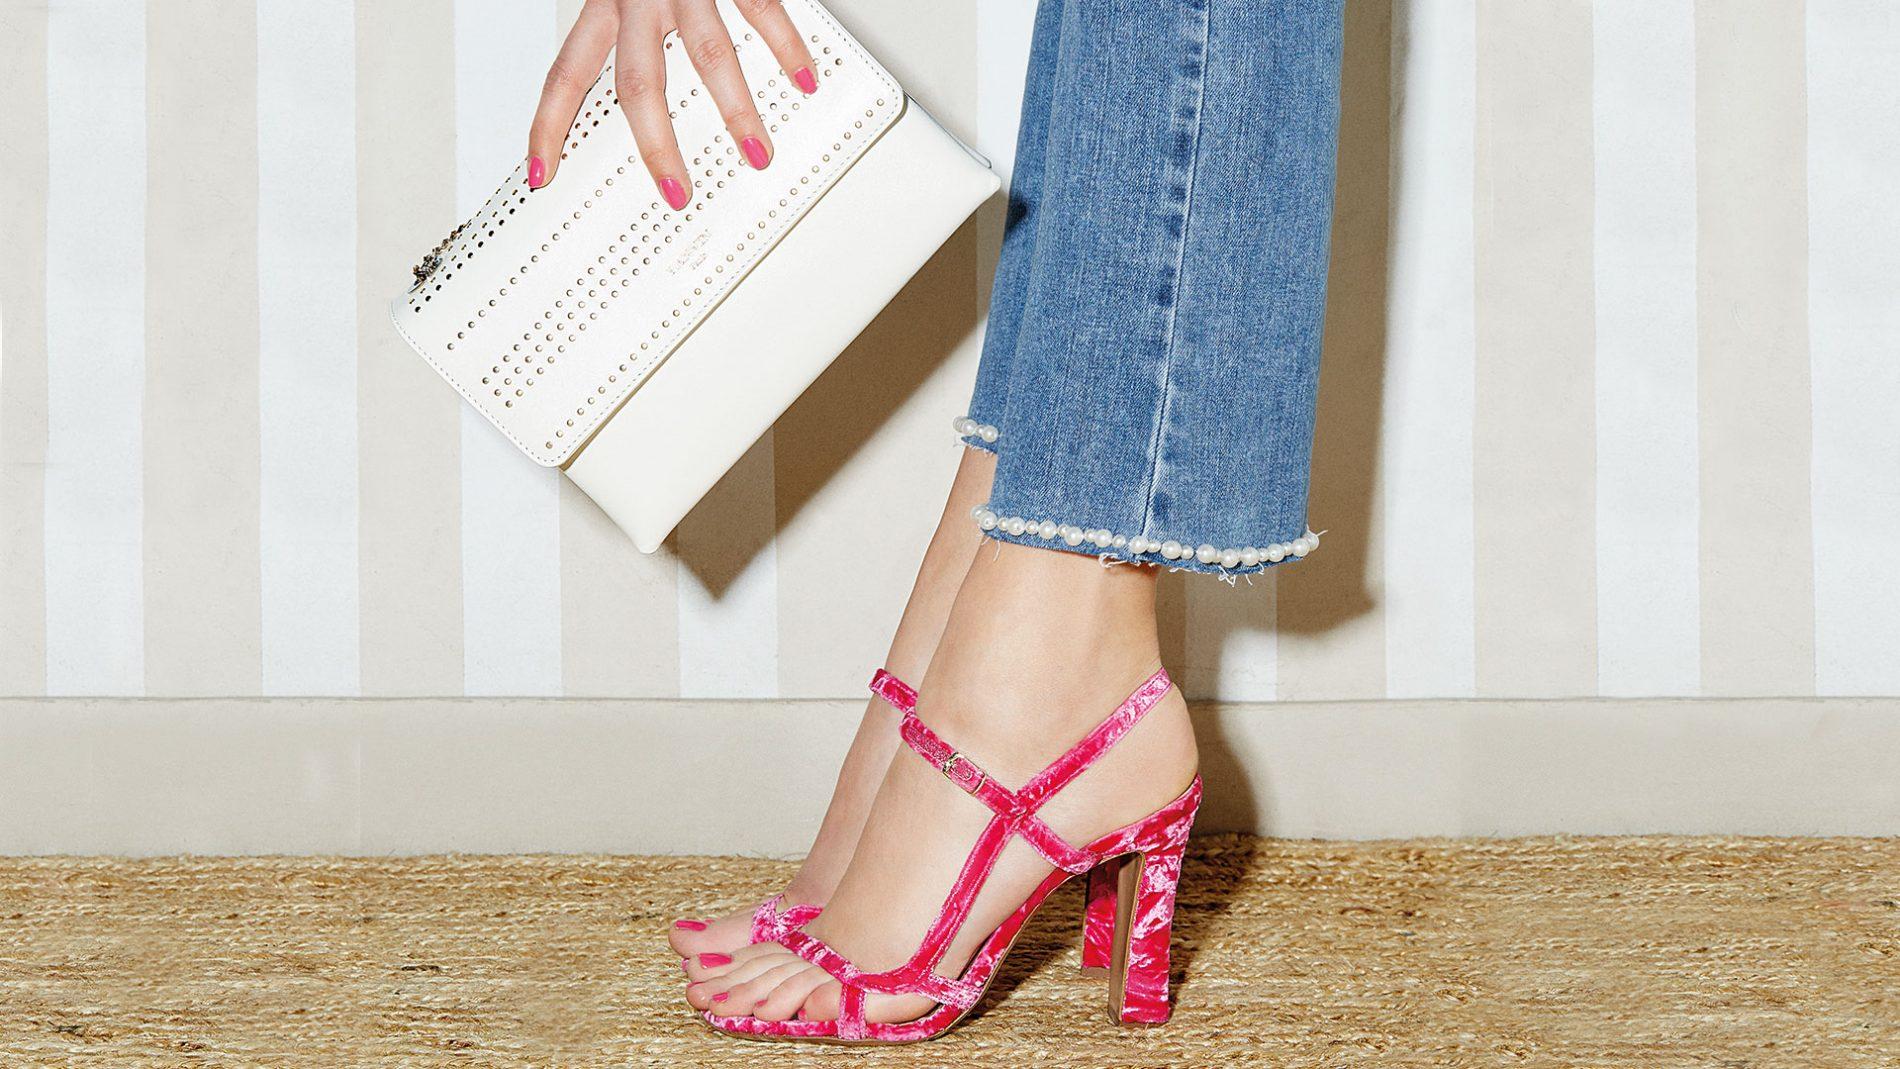 El Corte Inglés Designer Shoes Handbags Dries Van Noten Lanvin